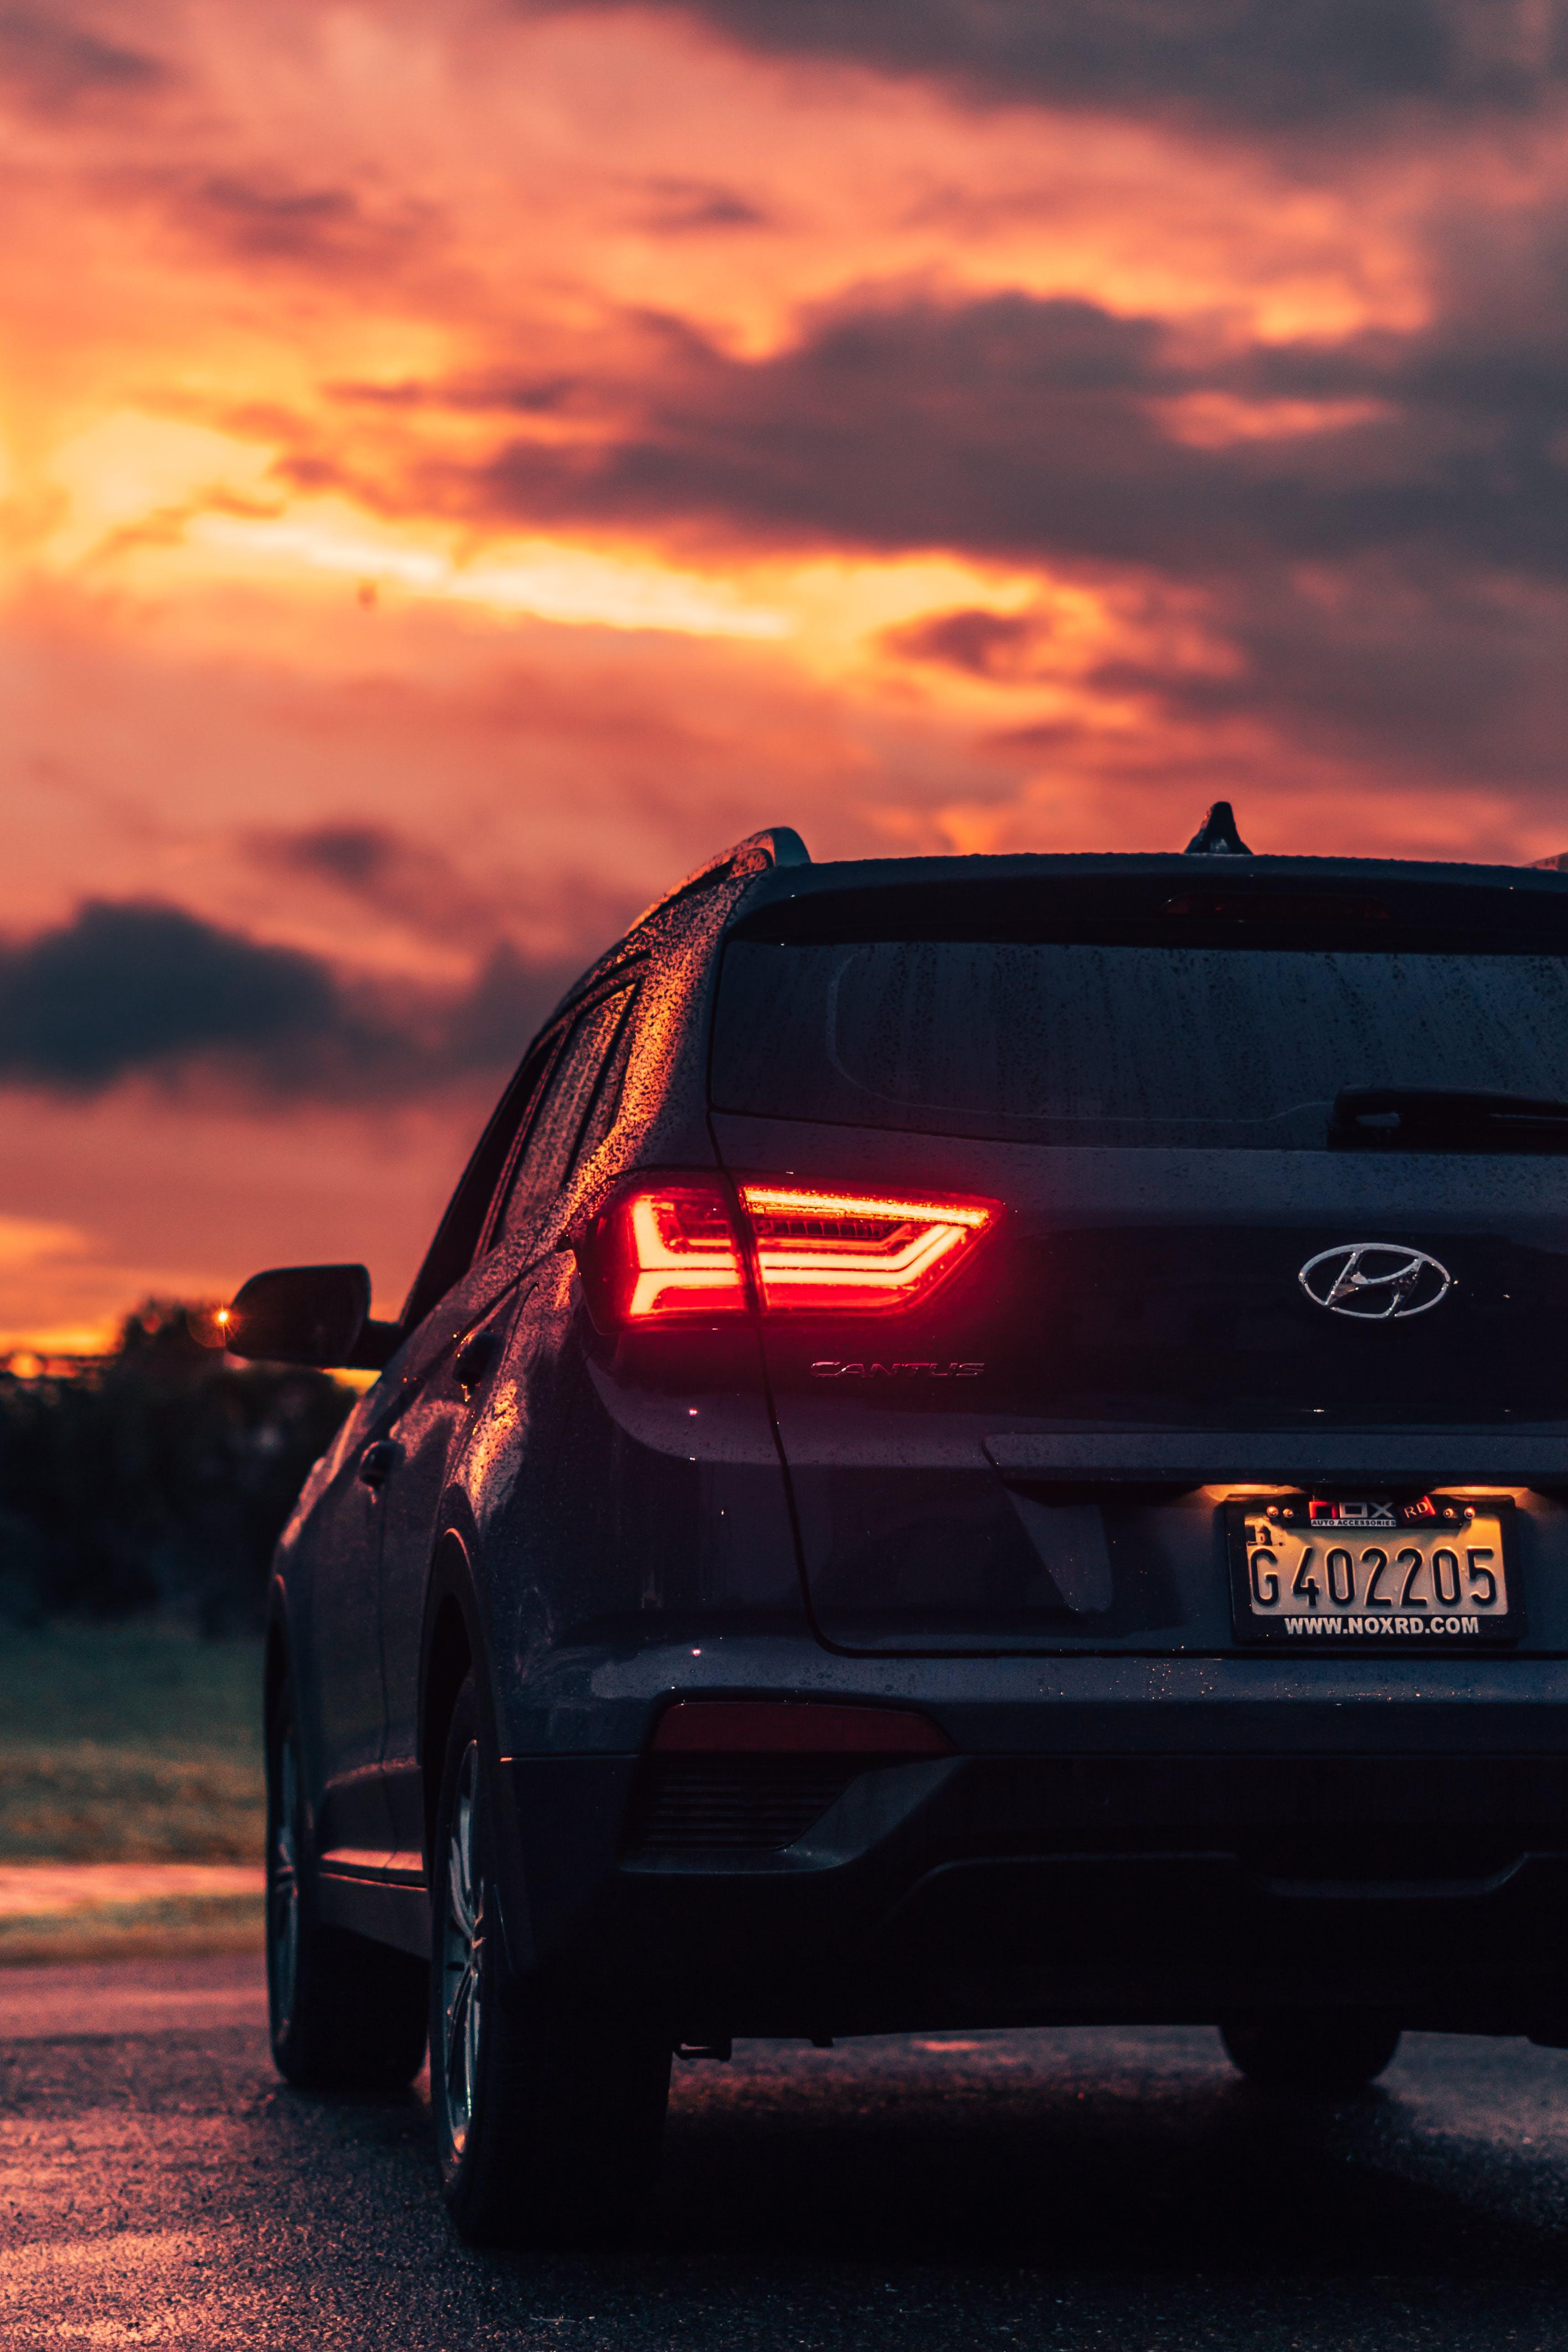 zu abend, asphalt, automobil, design